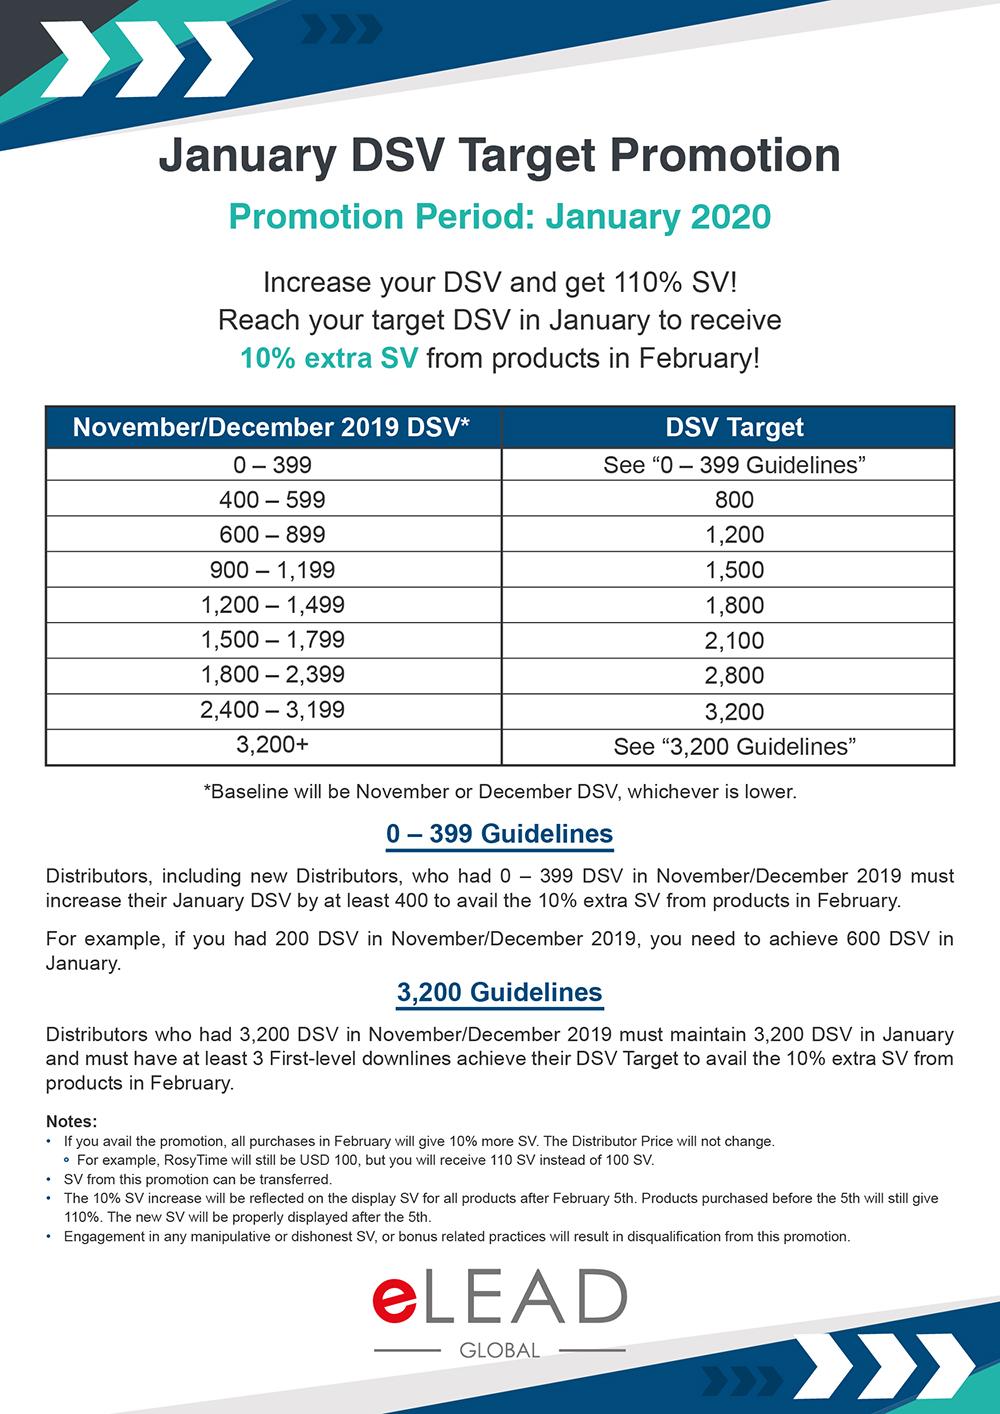 January DSV Target Promotion